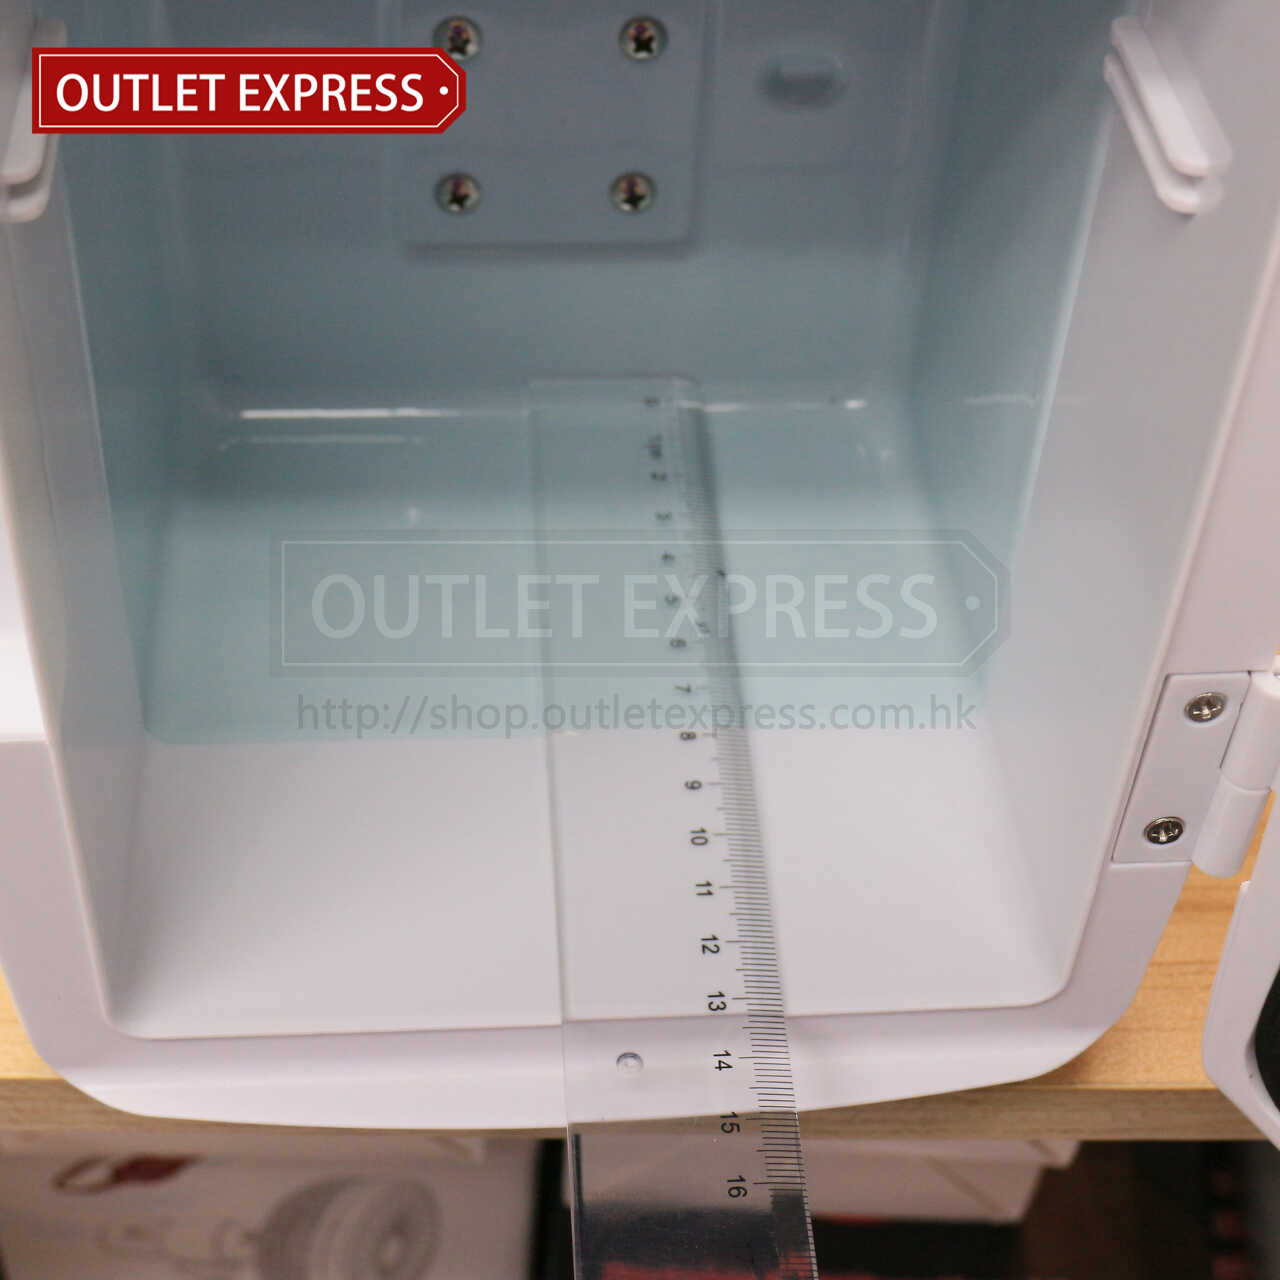 4L 冷暖兩用迷你小雪櫃 | 可車載或家用 內格深度- Outlet Express HK生活百貨城實拍相片